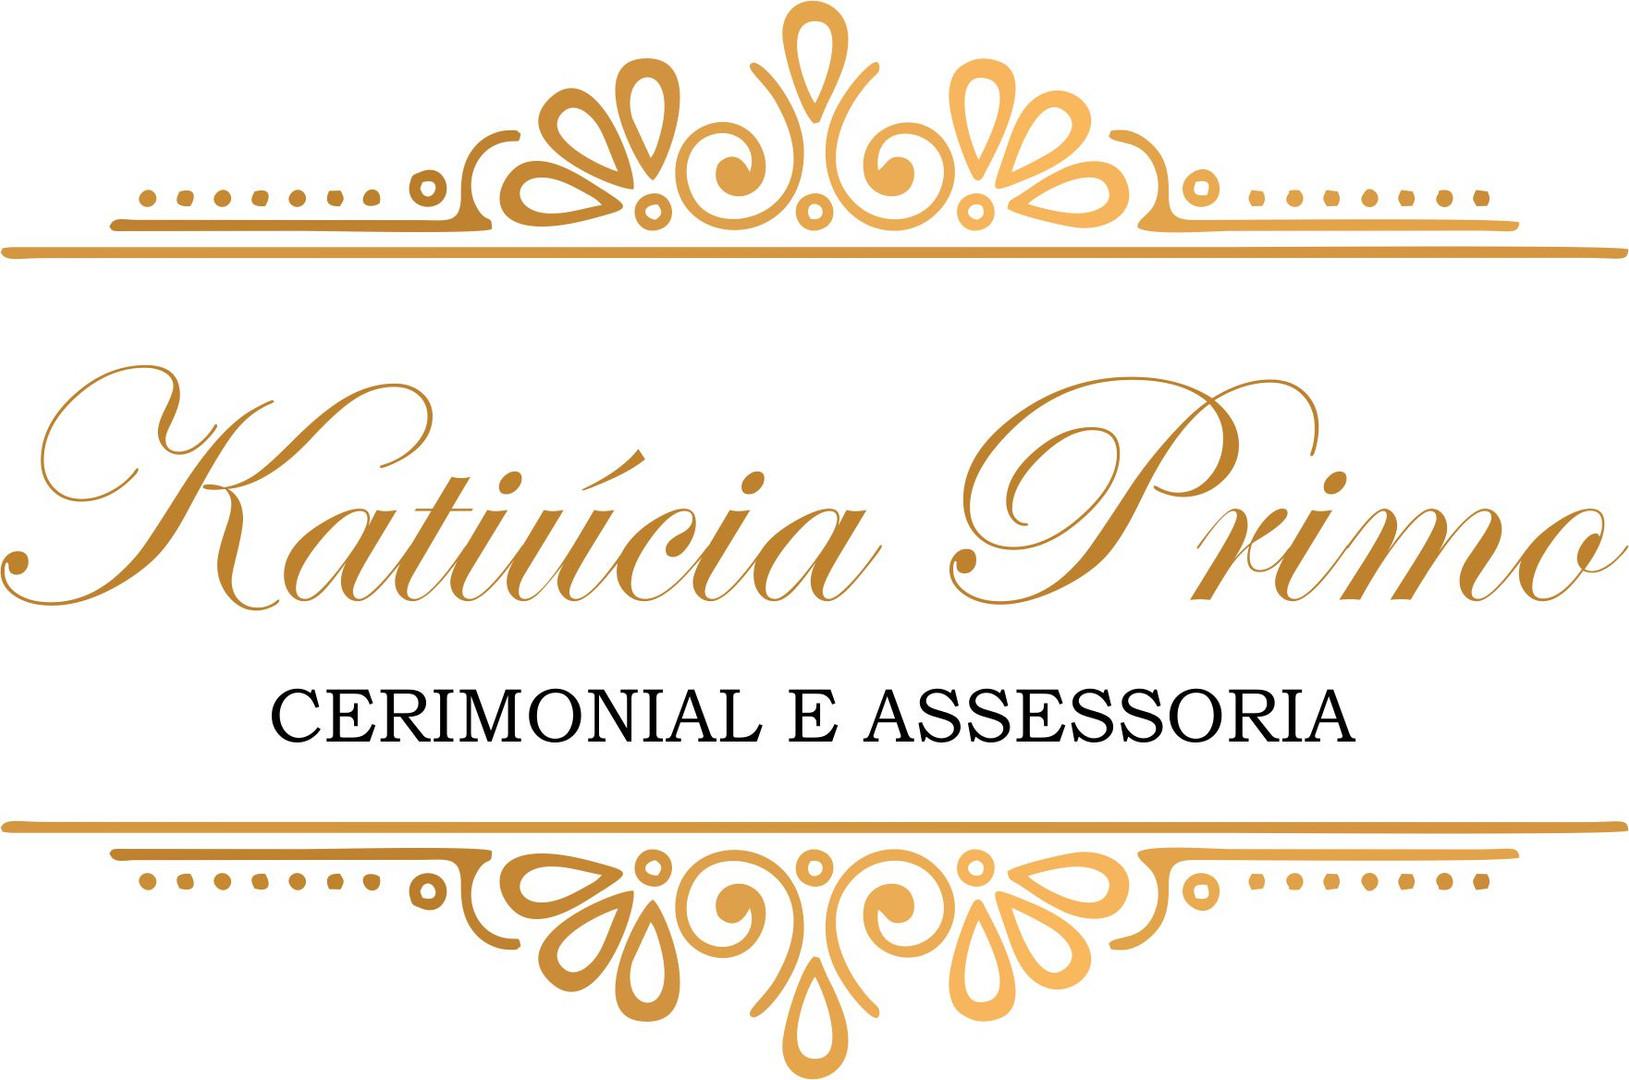 KATIUCIA PRIMO.jpg